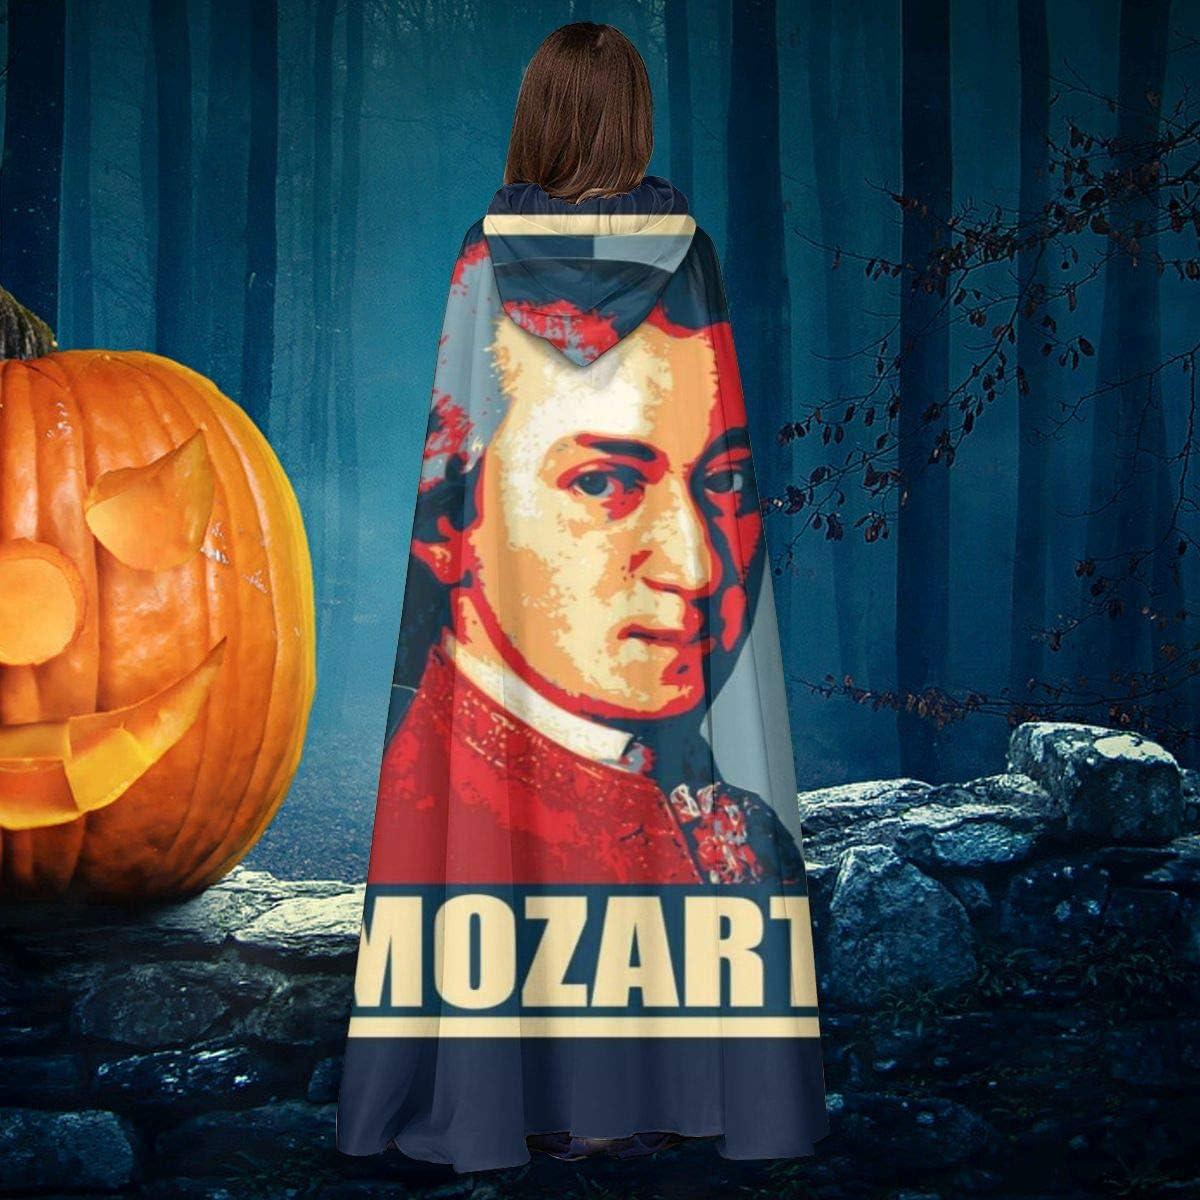 OJIPASD Mozart Propaganda Pop Art - Capa de Disfraz de Bruja con ...